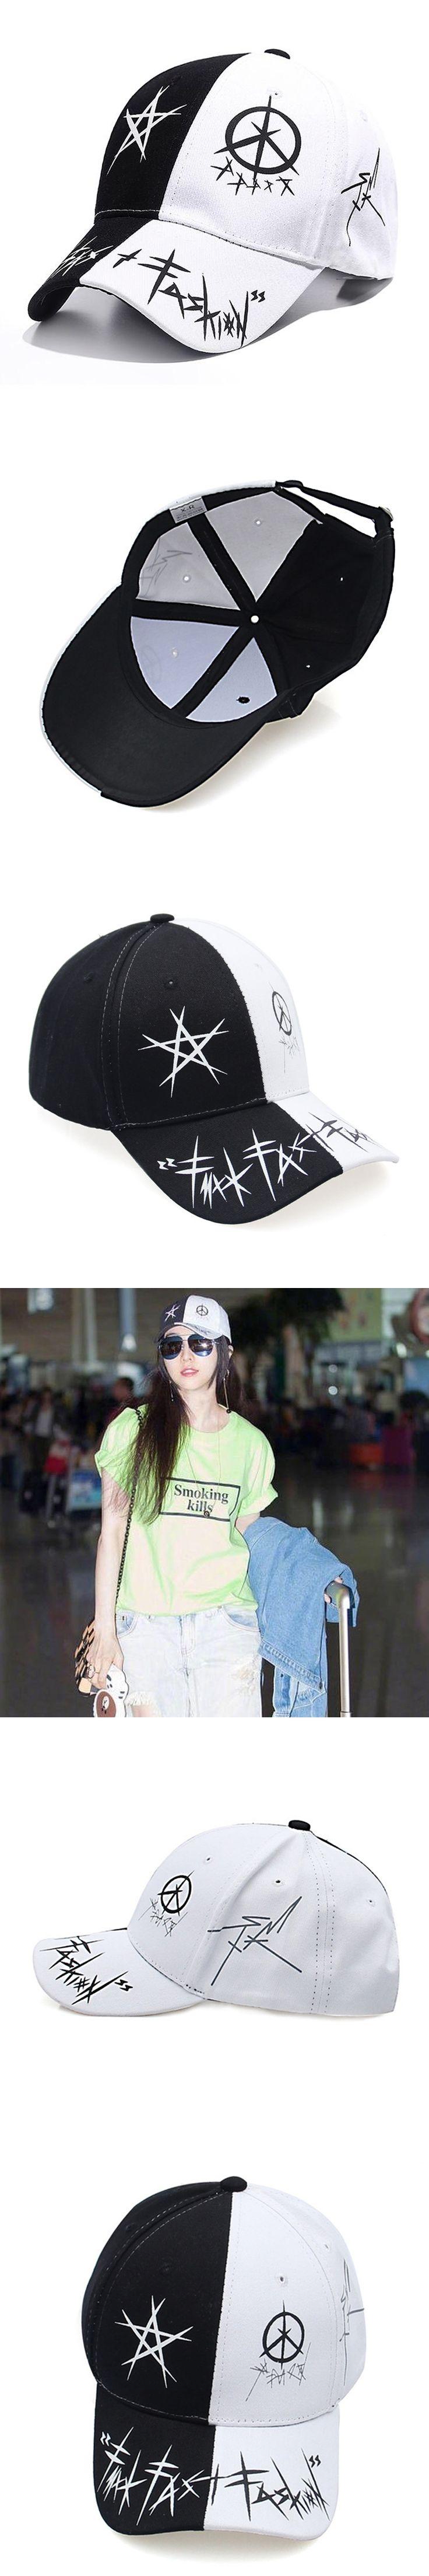 Brush graffiti baseball cap unisex solid Patch Ring Safety Pin curved hats baseball cap men women snapback caps casquette gorras